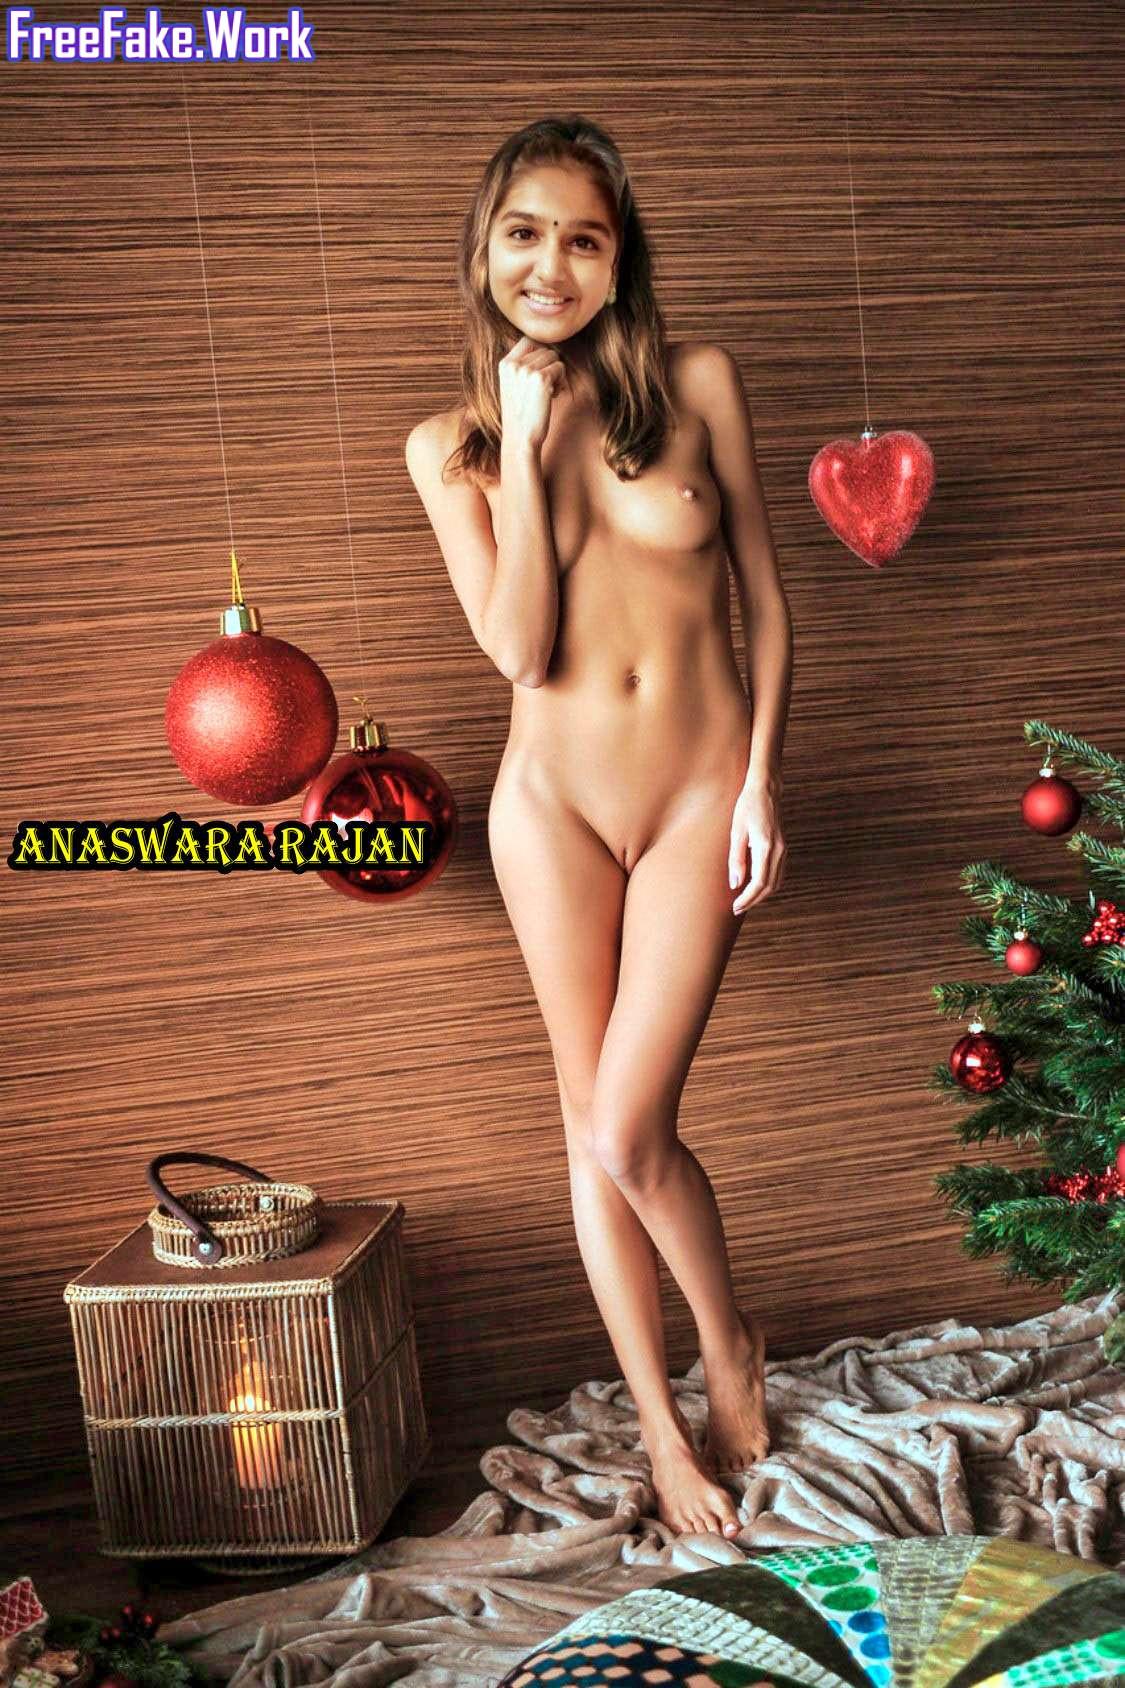 Anaswara-Rajan-naked-slim-body-without-Christmas-special-dress.jpg